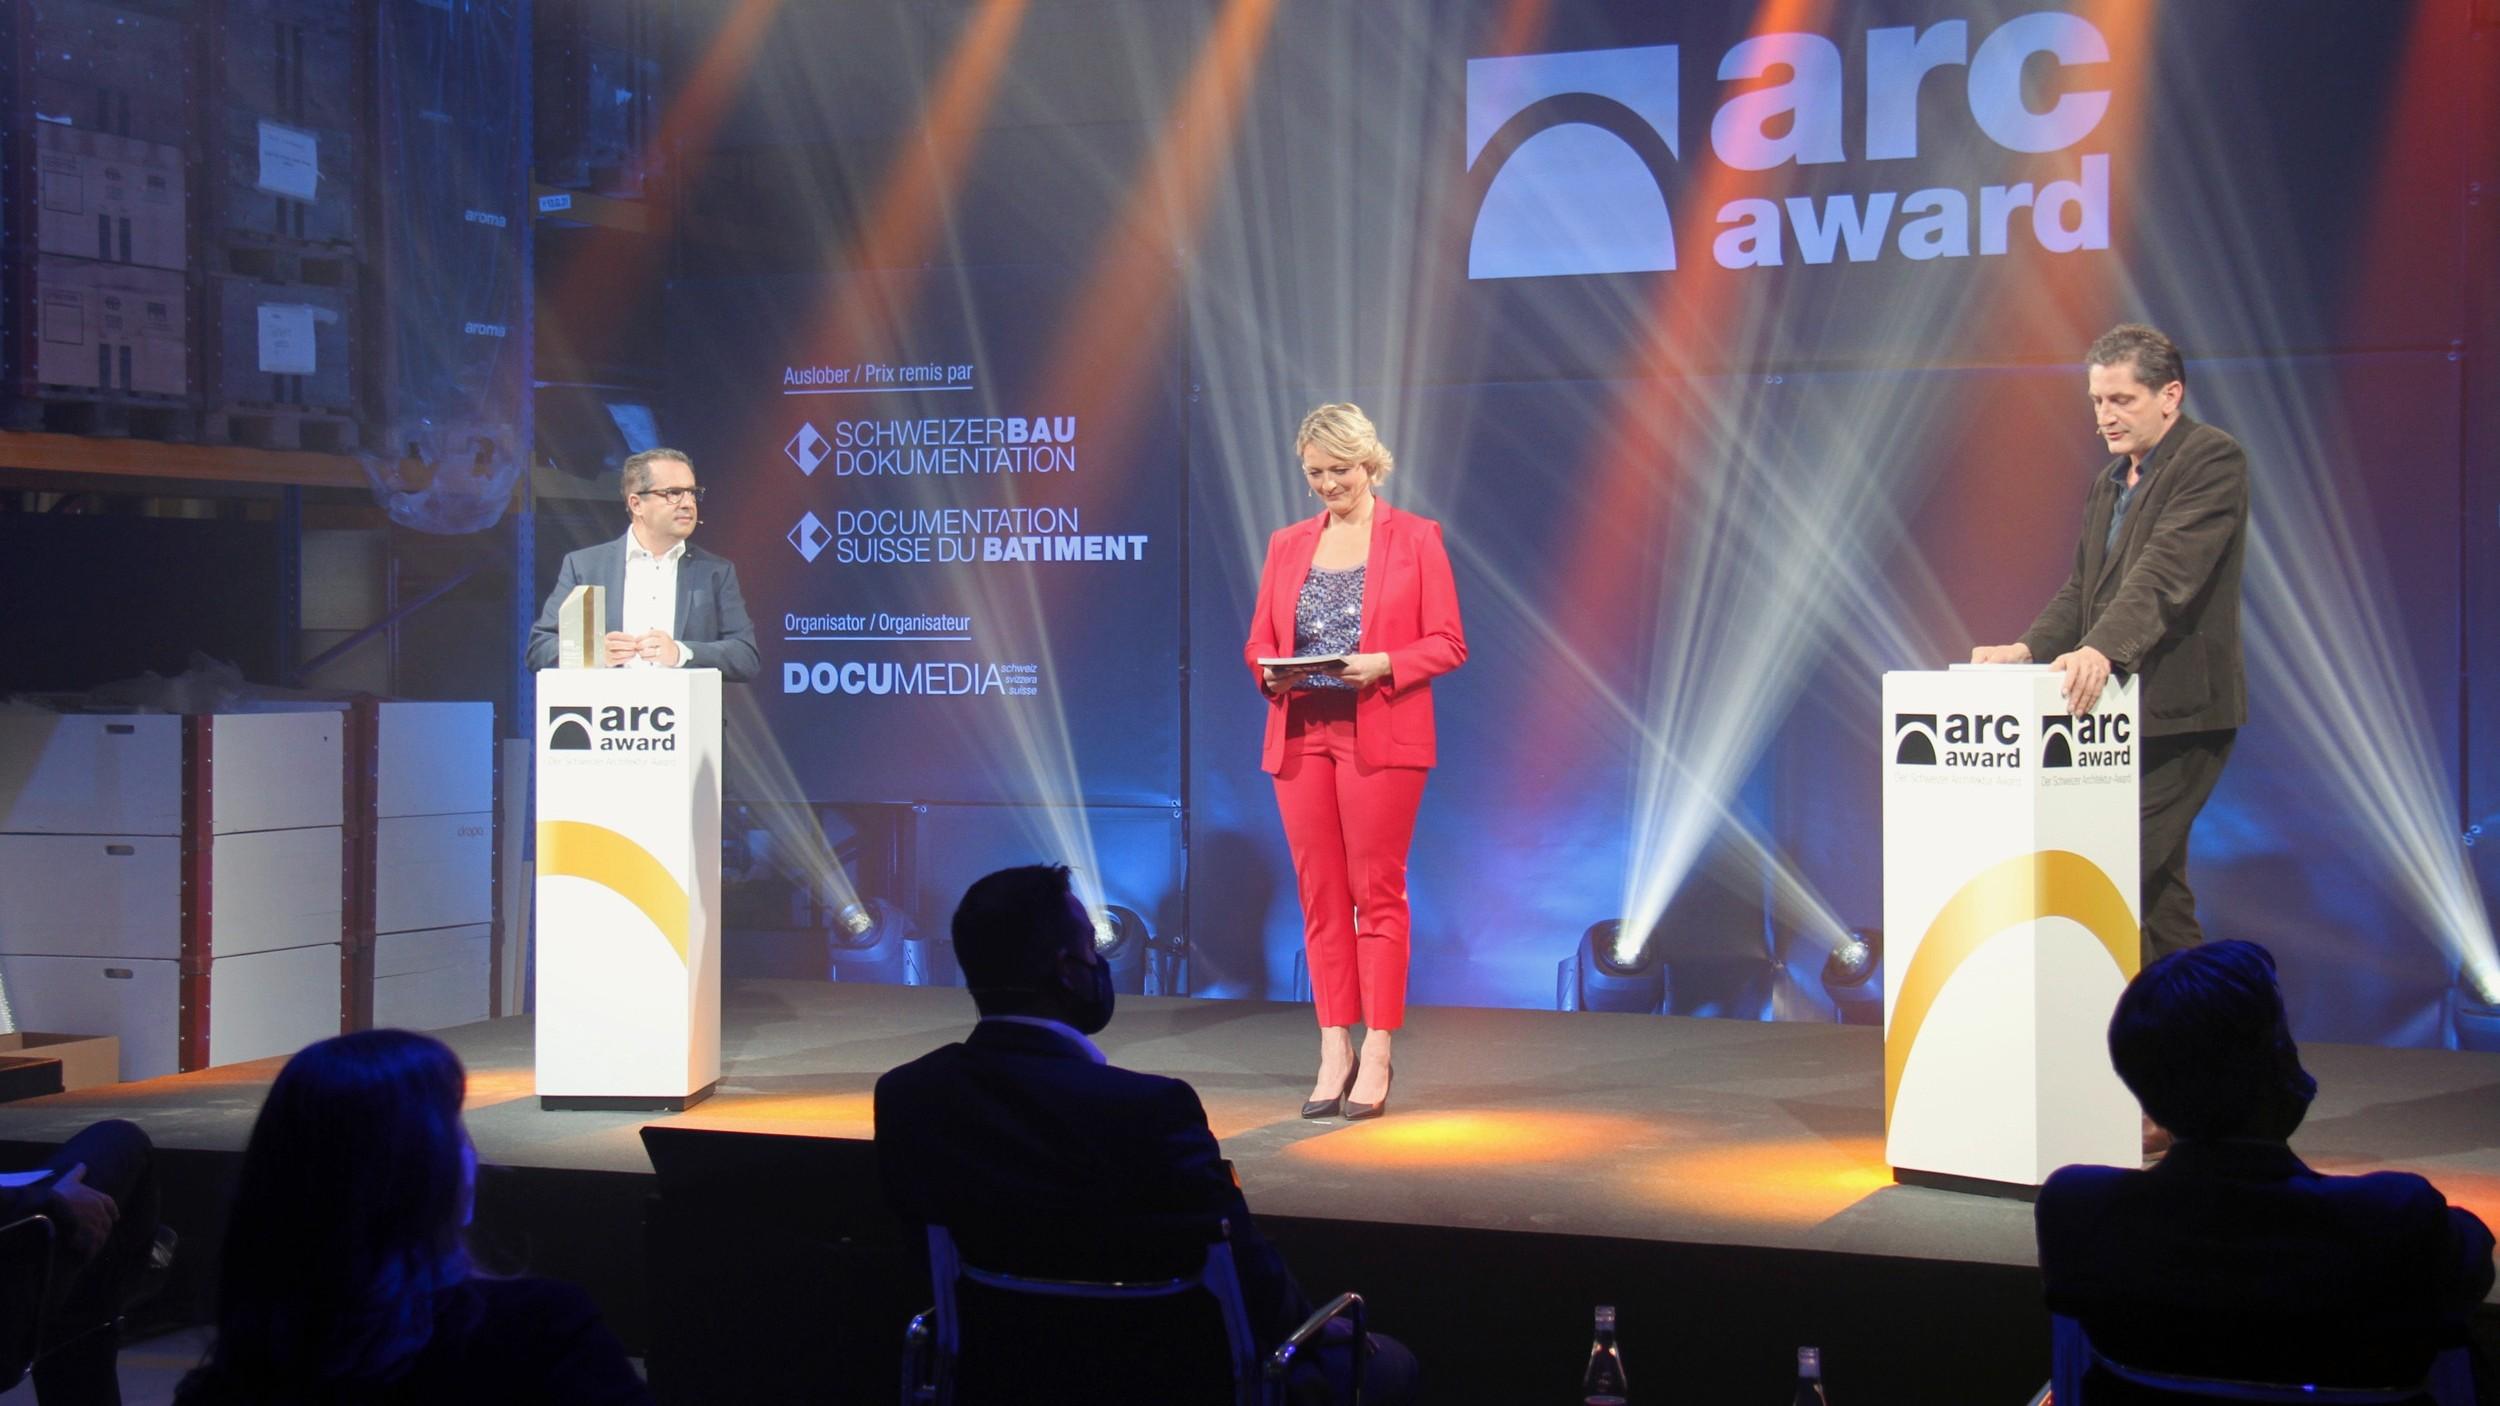 Preisverleihung des Arc-Award